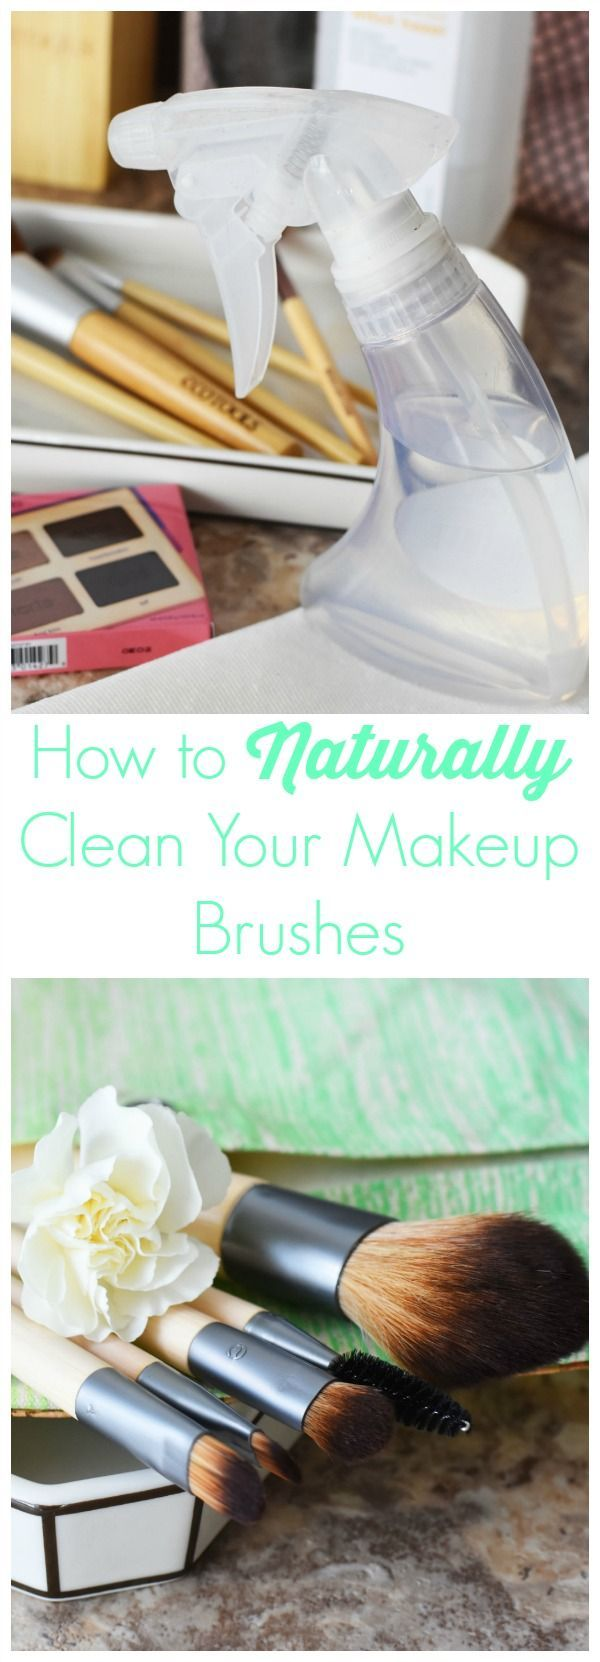 Mejores 60 imágenes de Nails en Pinterest   Estilos de maquillaje ...